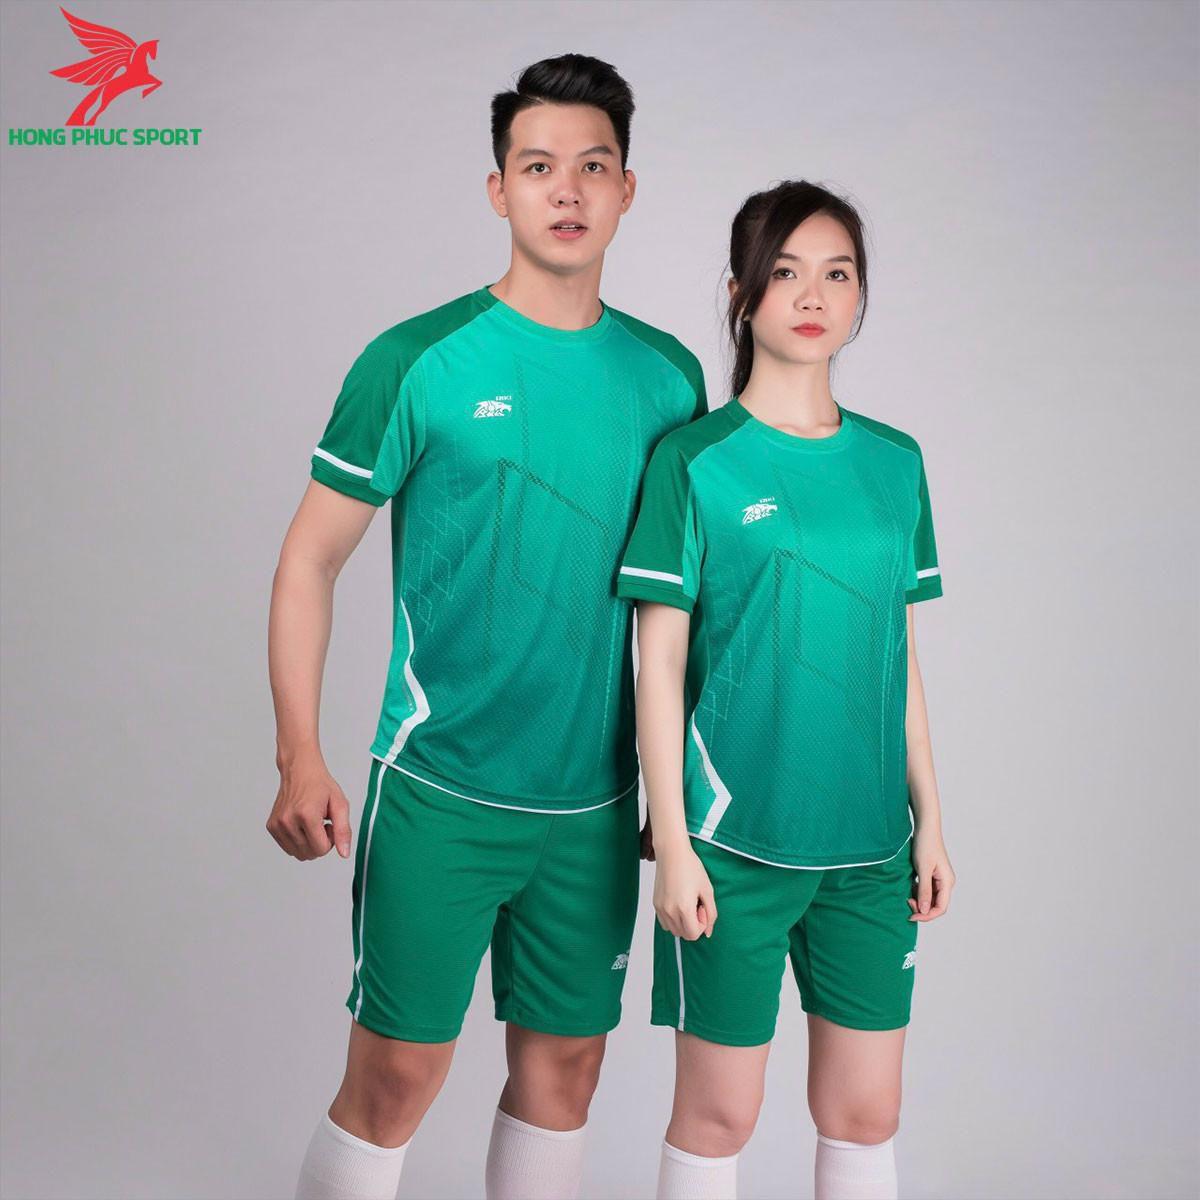 https://cdn.hongphucsport.com/unsafe/s4.shopbay.vn/files/285/ao-khong-logo-riki-airmaxx-mau-ngoc-reu-2-603eee60a0b15.jpg